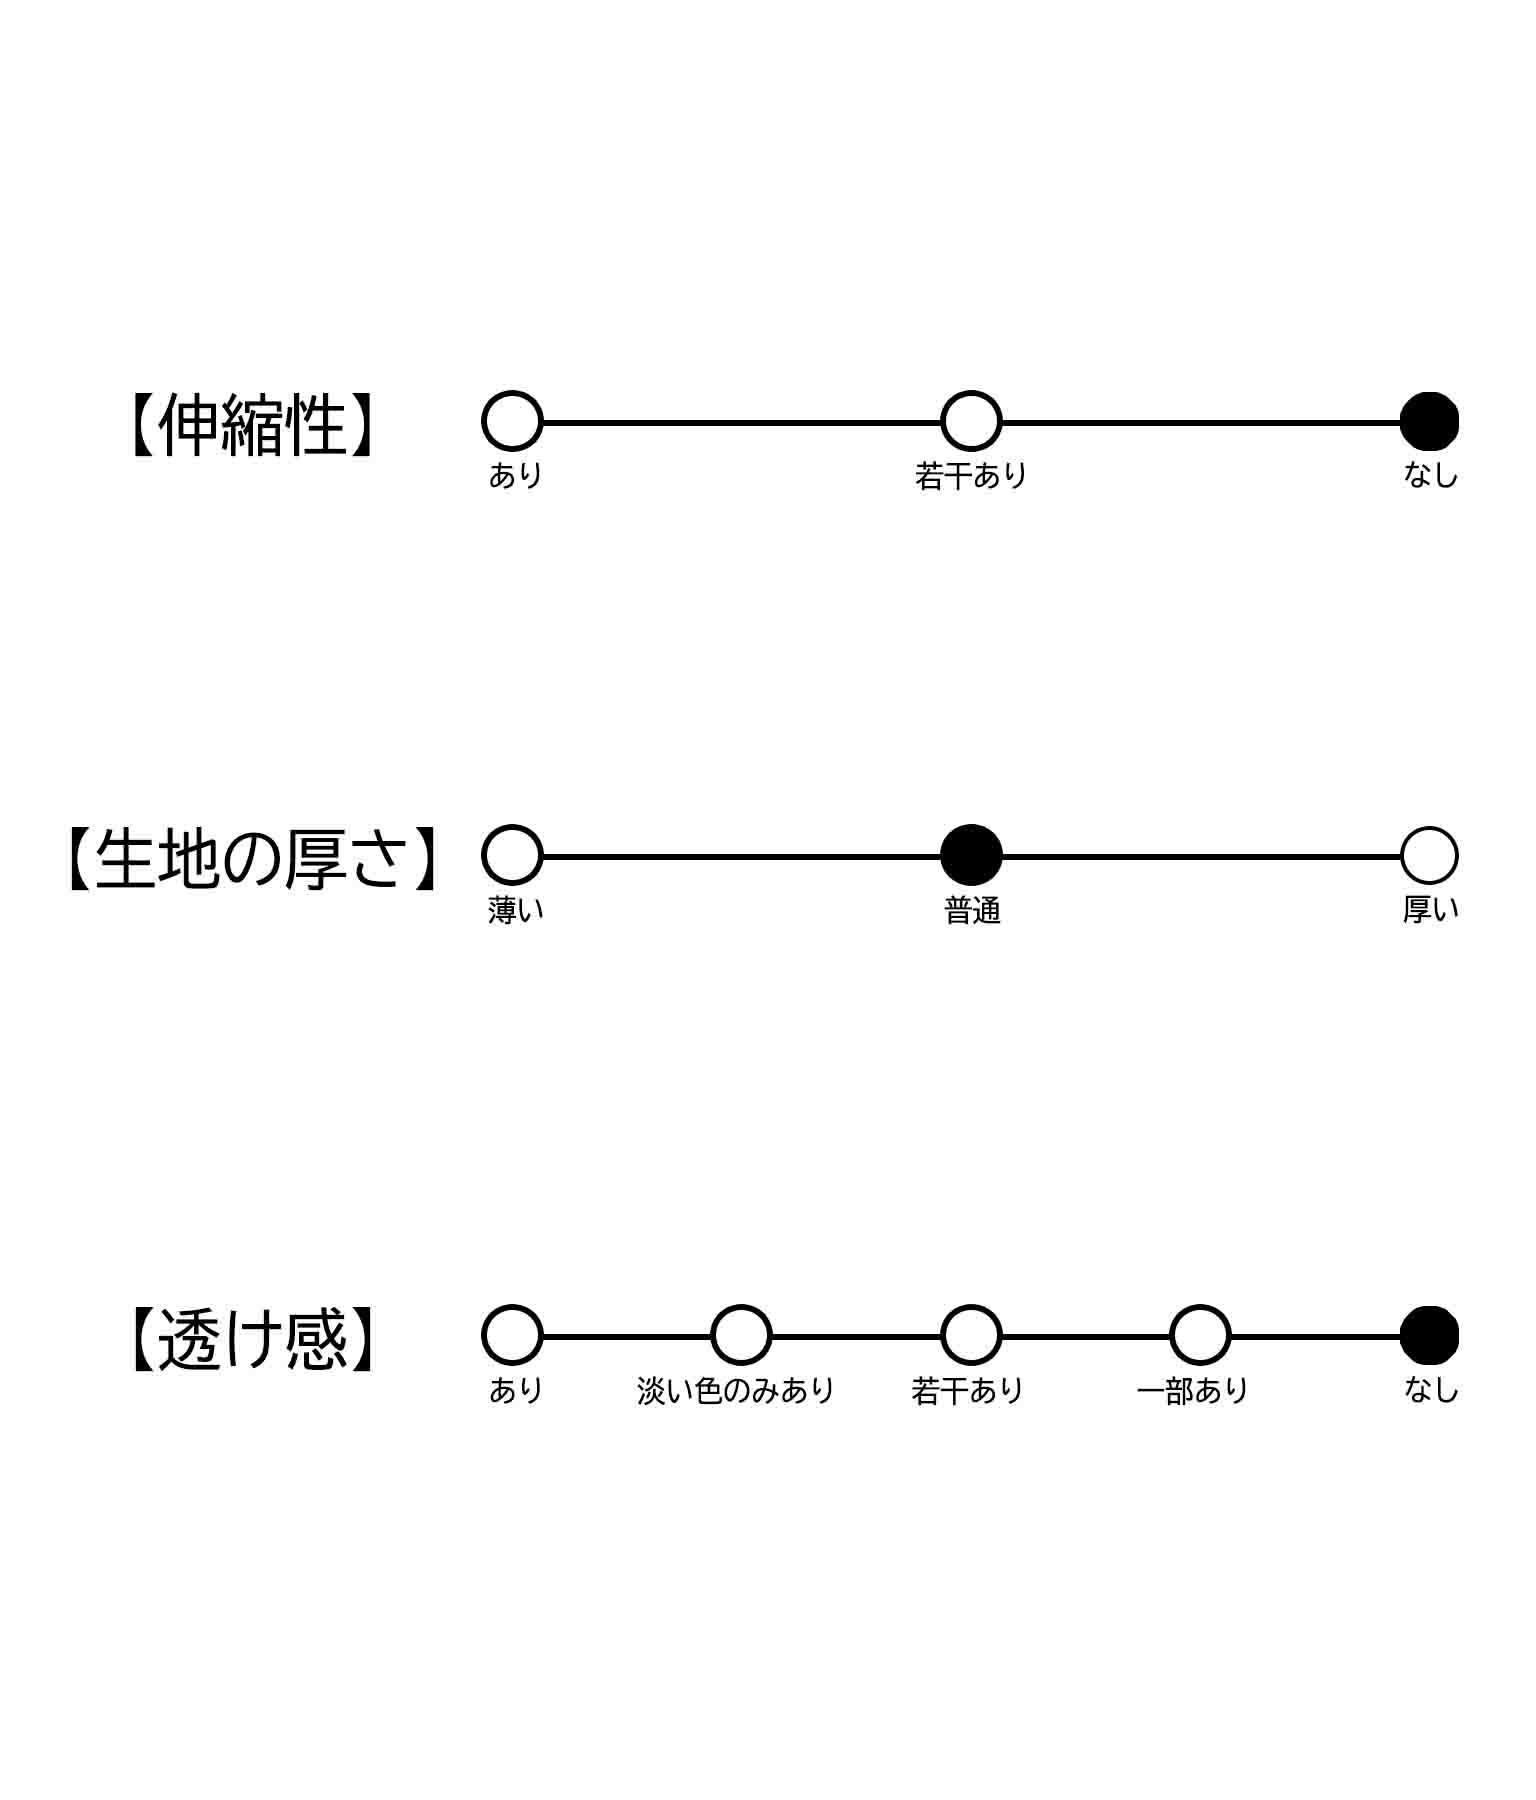 MA-1(アウター(コート・ジャケット) /ジャケット・ブルゾン) | ANAP KIDS